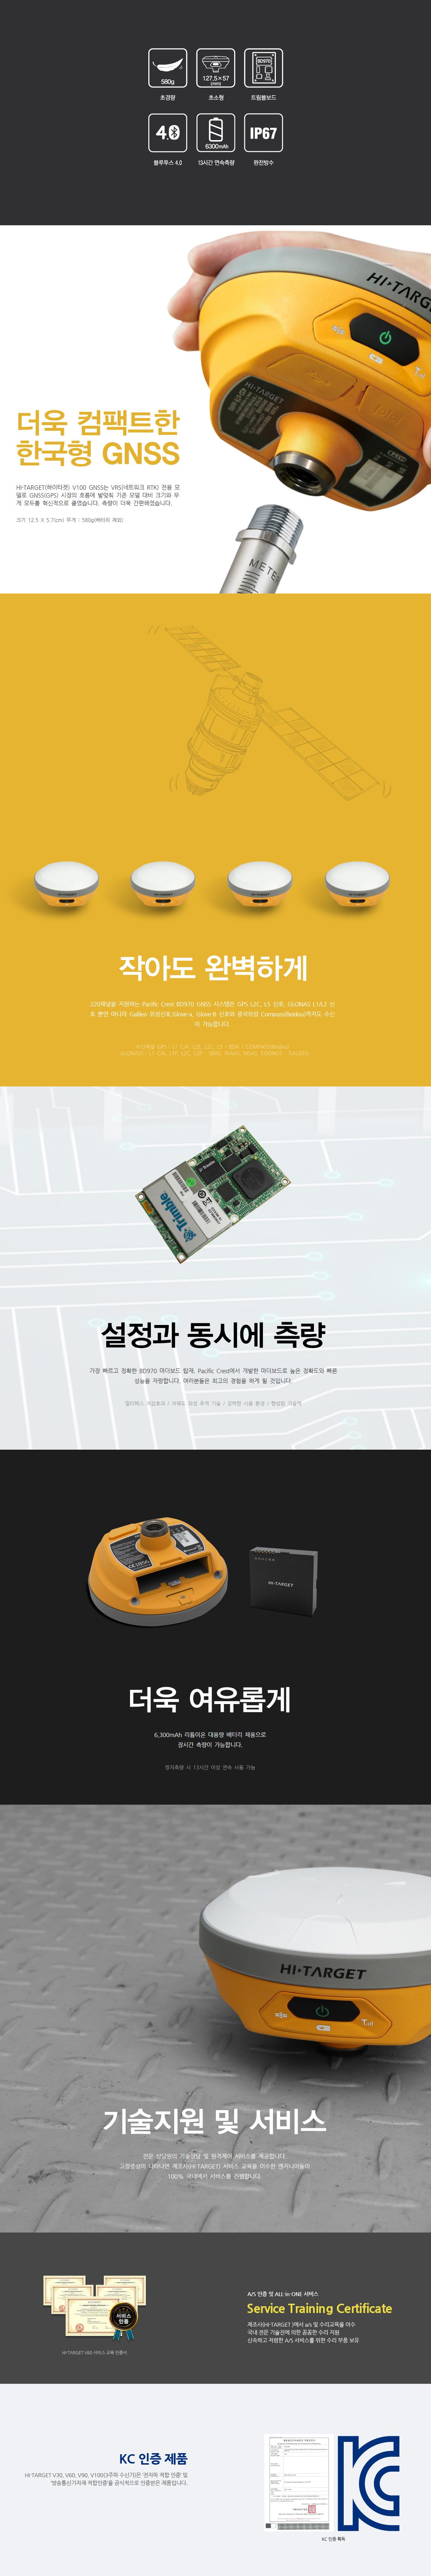 HI-TARGET V100 측량용 GPS 한국형 GNSS 시스템 국토정보공사 LX 납품브랜드 국내유일 한국 소프트웨어 하이타겟 초경량 초소형 트림블 BD970 블루투스4.0 완전방수 VRS(네트워크 RTK) 전용 모델 간편 측량